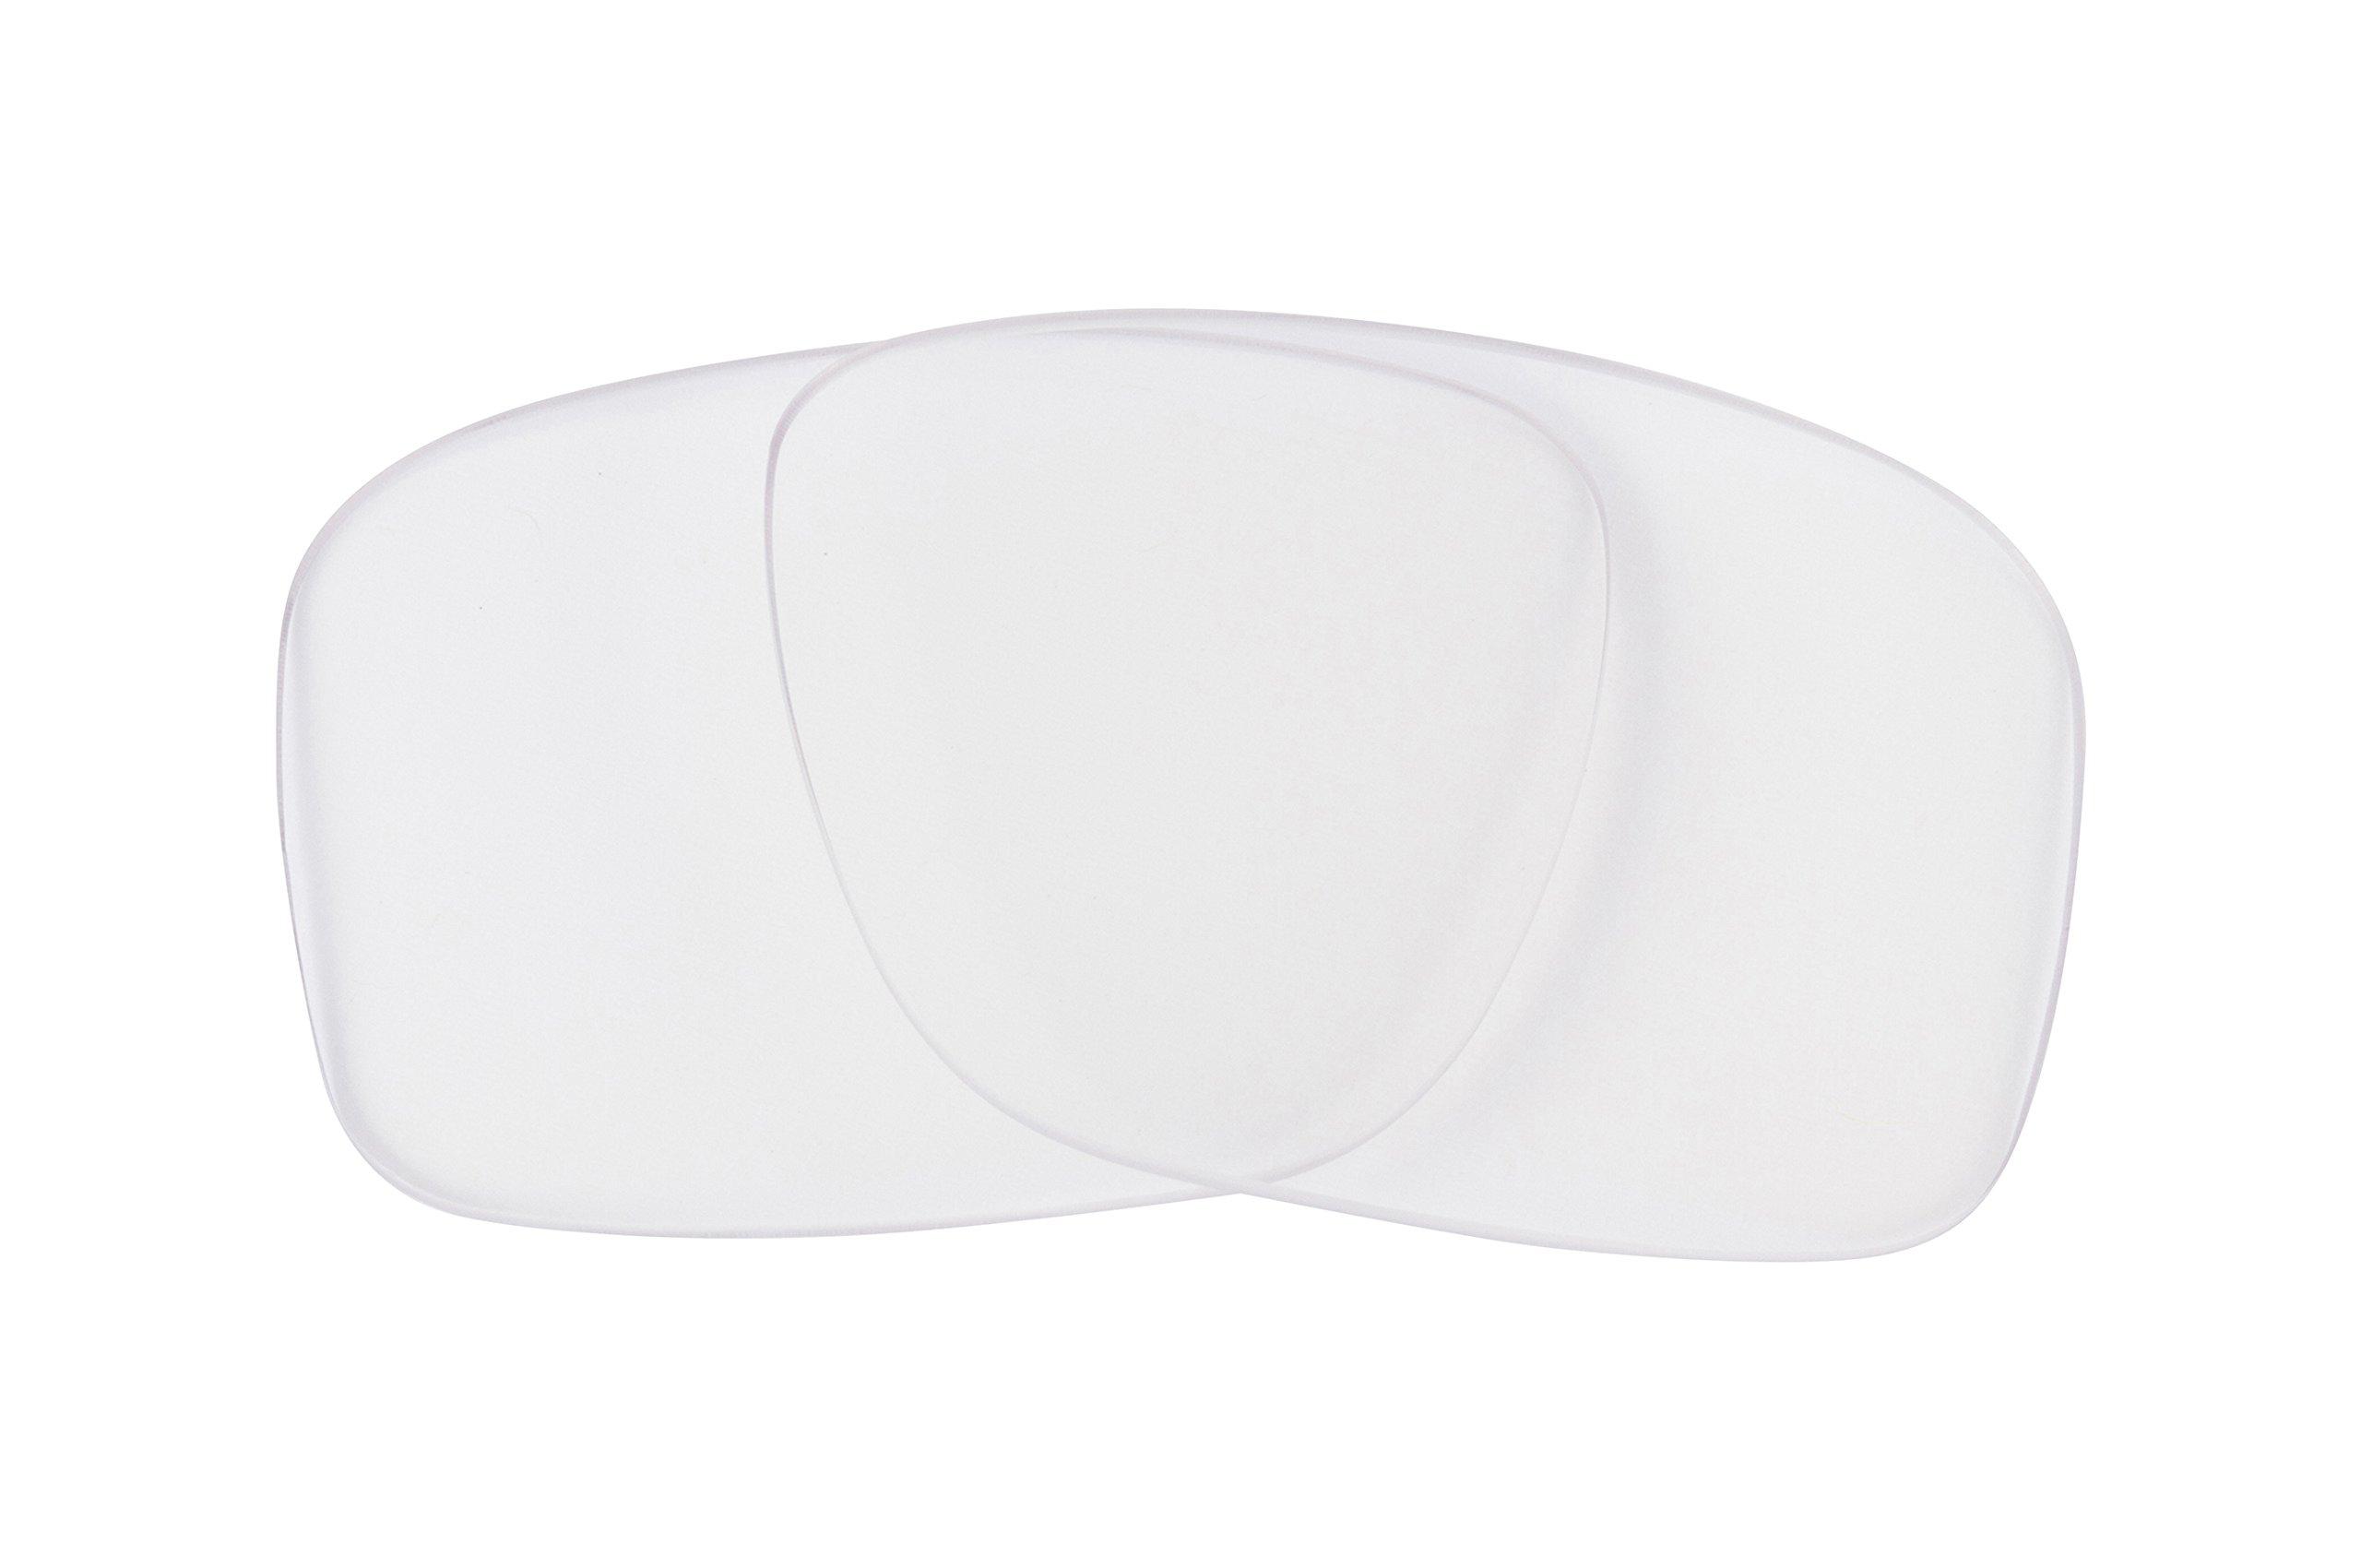 SeekOptics Replacement Lenses Compatible with Spy Optics Frazier Sunglasses